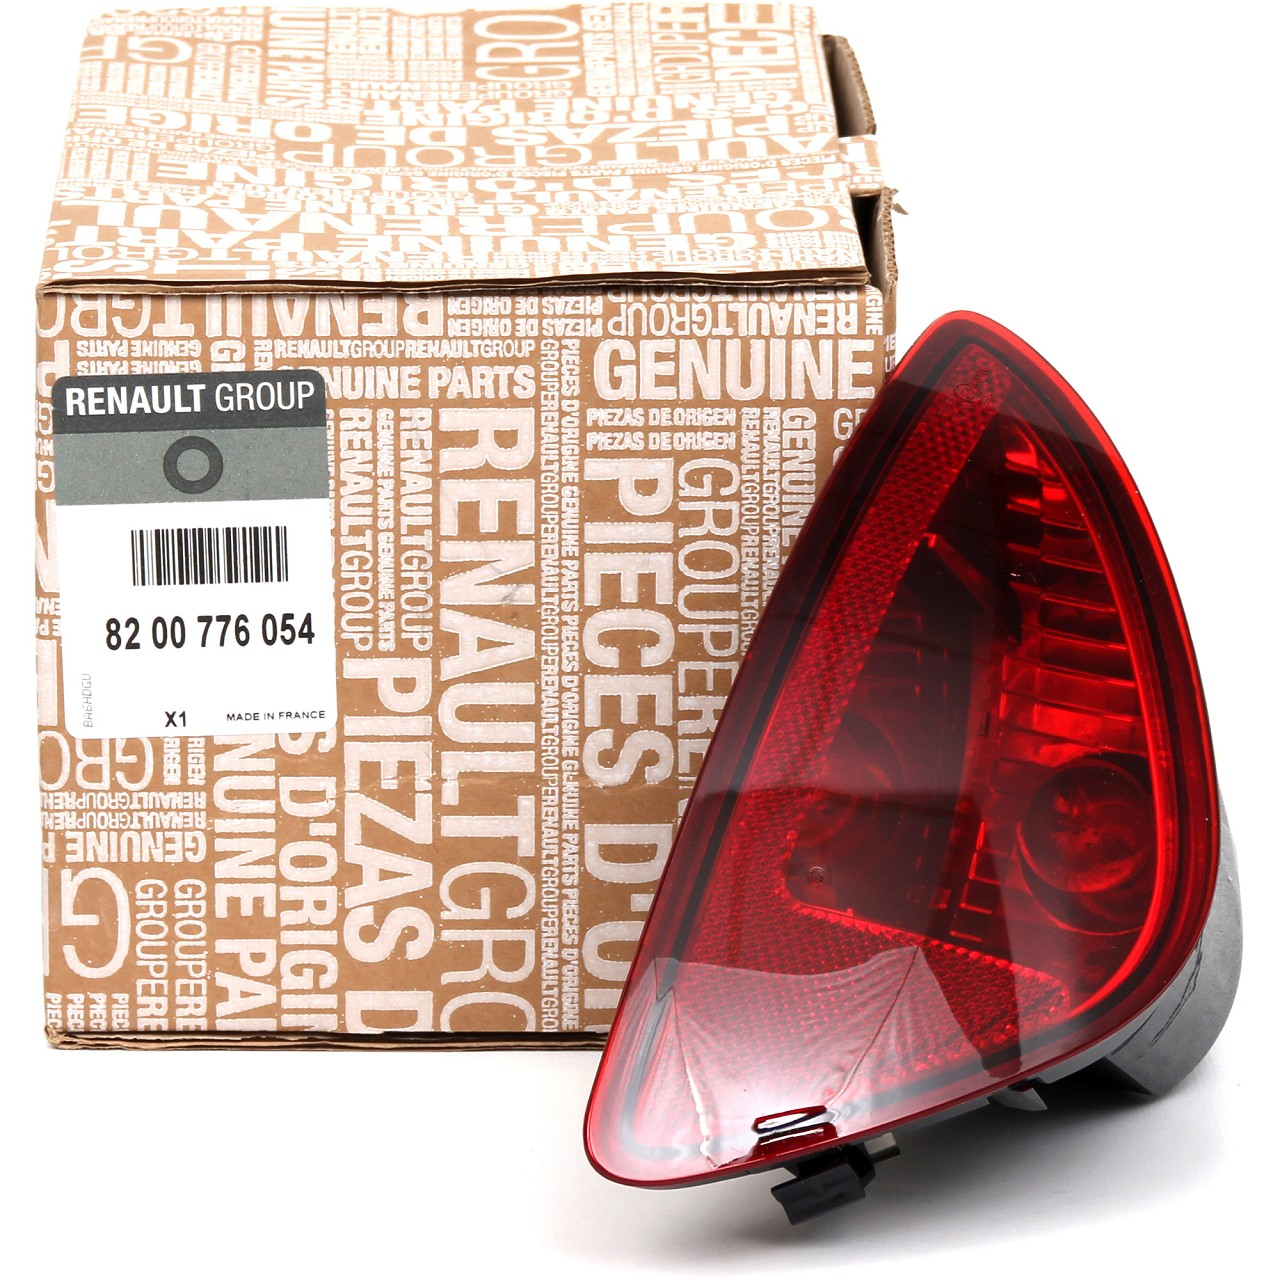 ORIGINAL Renault Reflektor Rückstrahler Stoßstange Clio III rechts 8200776054